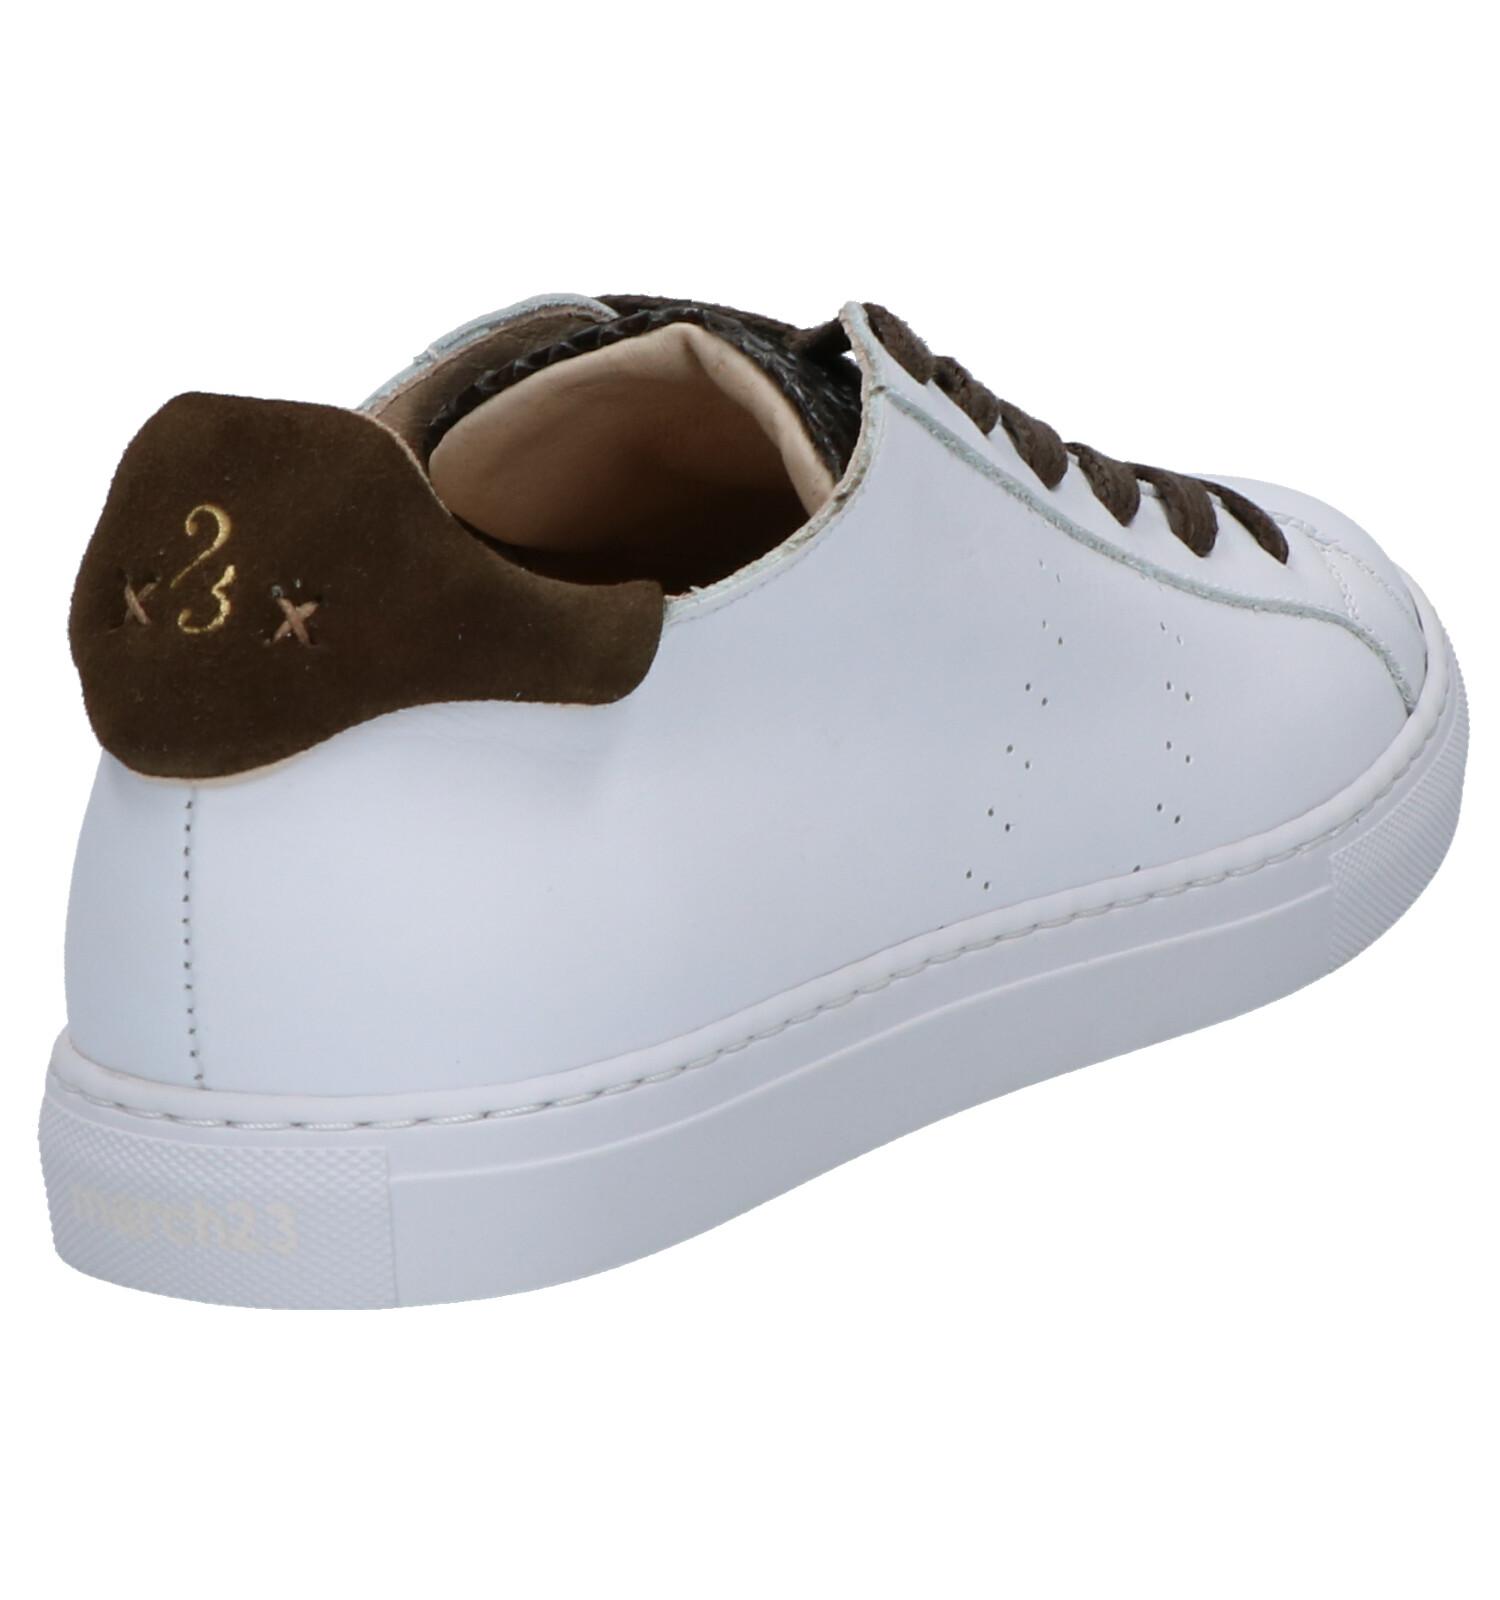 March23 Sneakers Elmar Witte March23 Elmar Sneakers Elmar Witte Witte March23 SMVqUzp